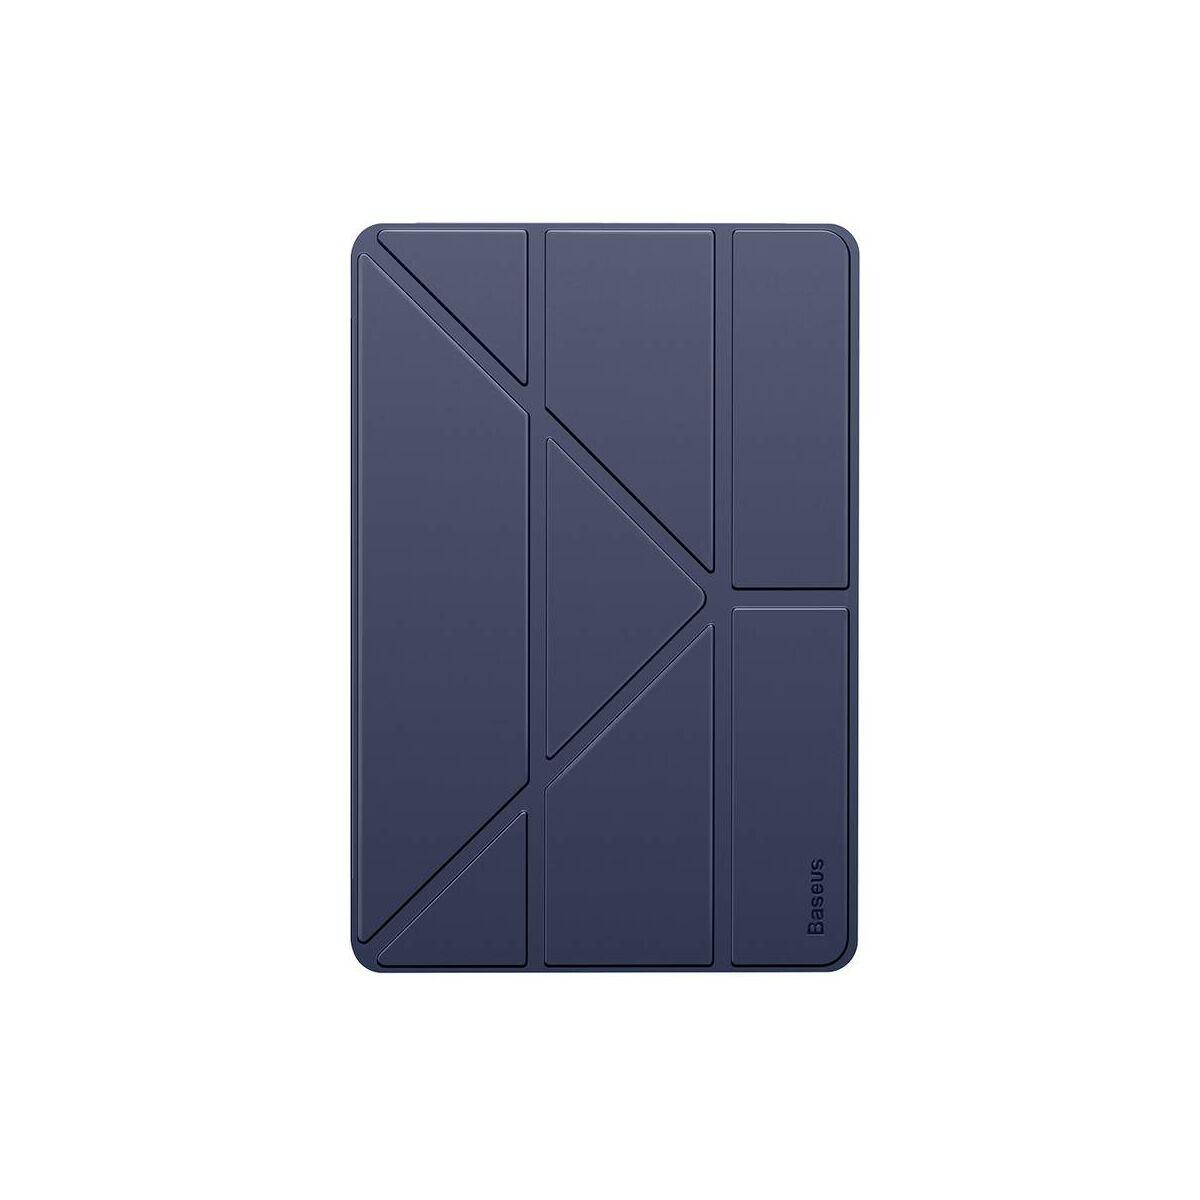 "Baseus iPad 10.2"" tok, Jane Y-Type bőr, smart bőr kijelzővédő tok, kék (LTAPIPD-G03)"